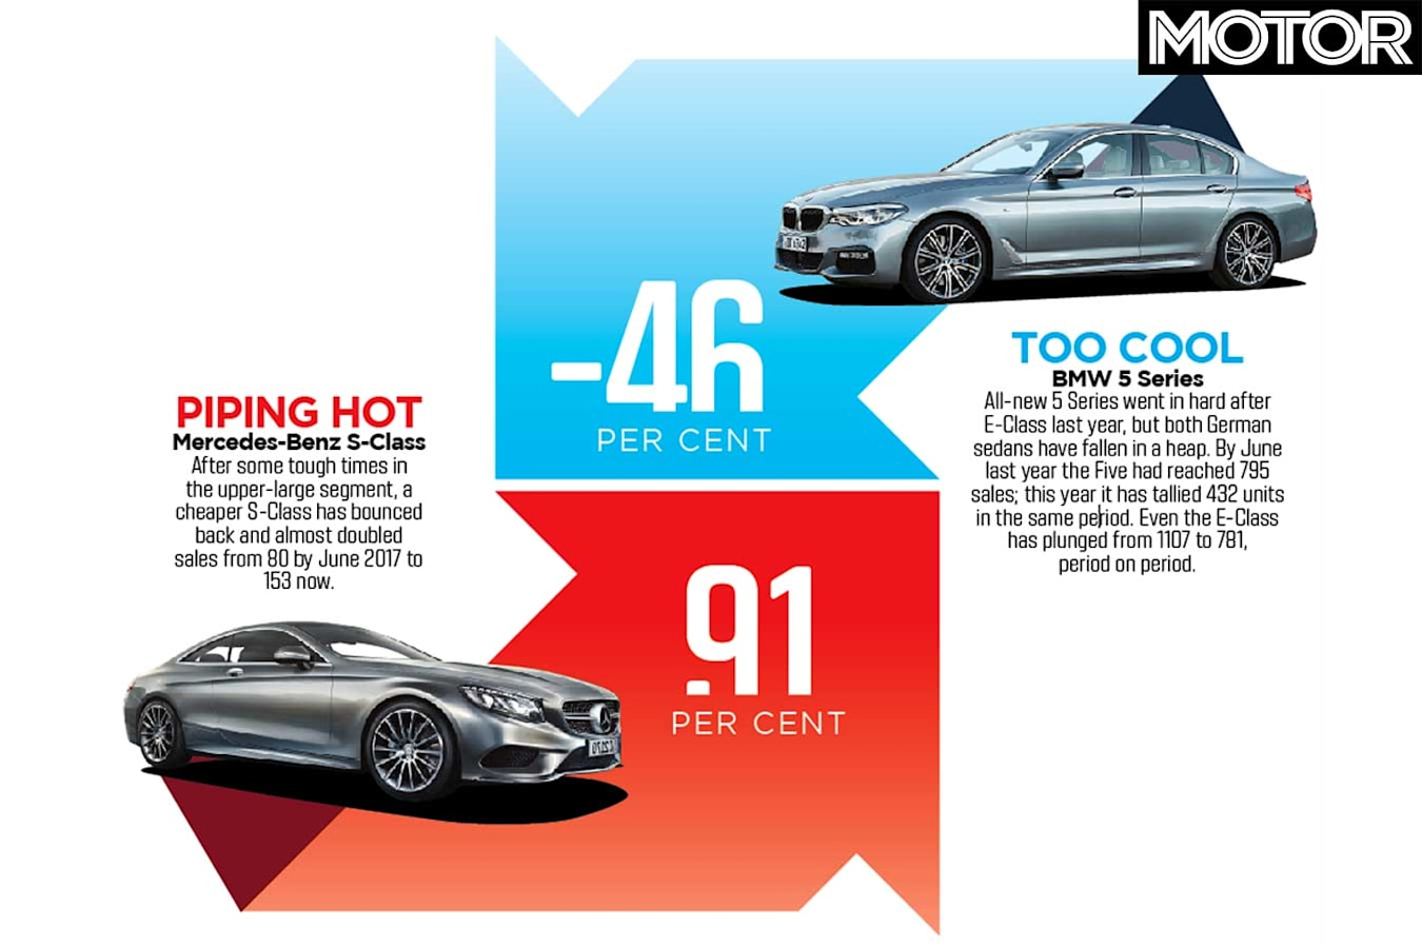 SU Vs Surge Coupes And Sports Cars Tumble Jpg